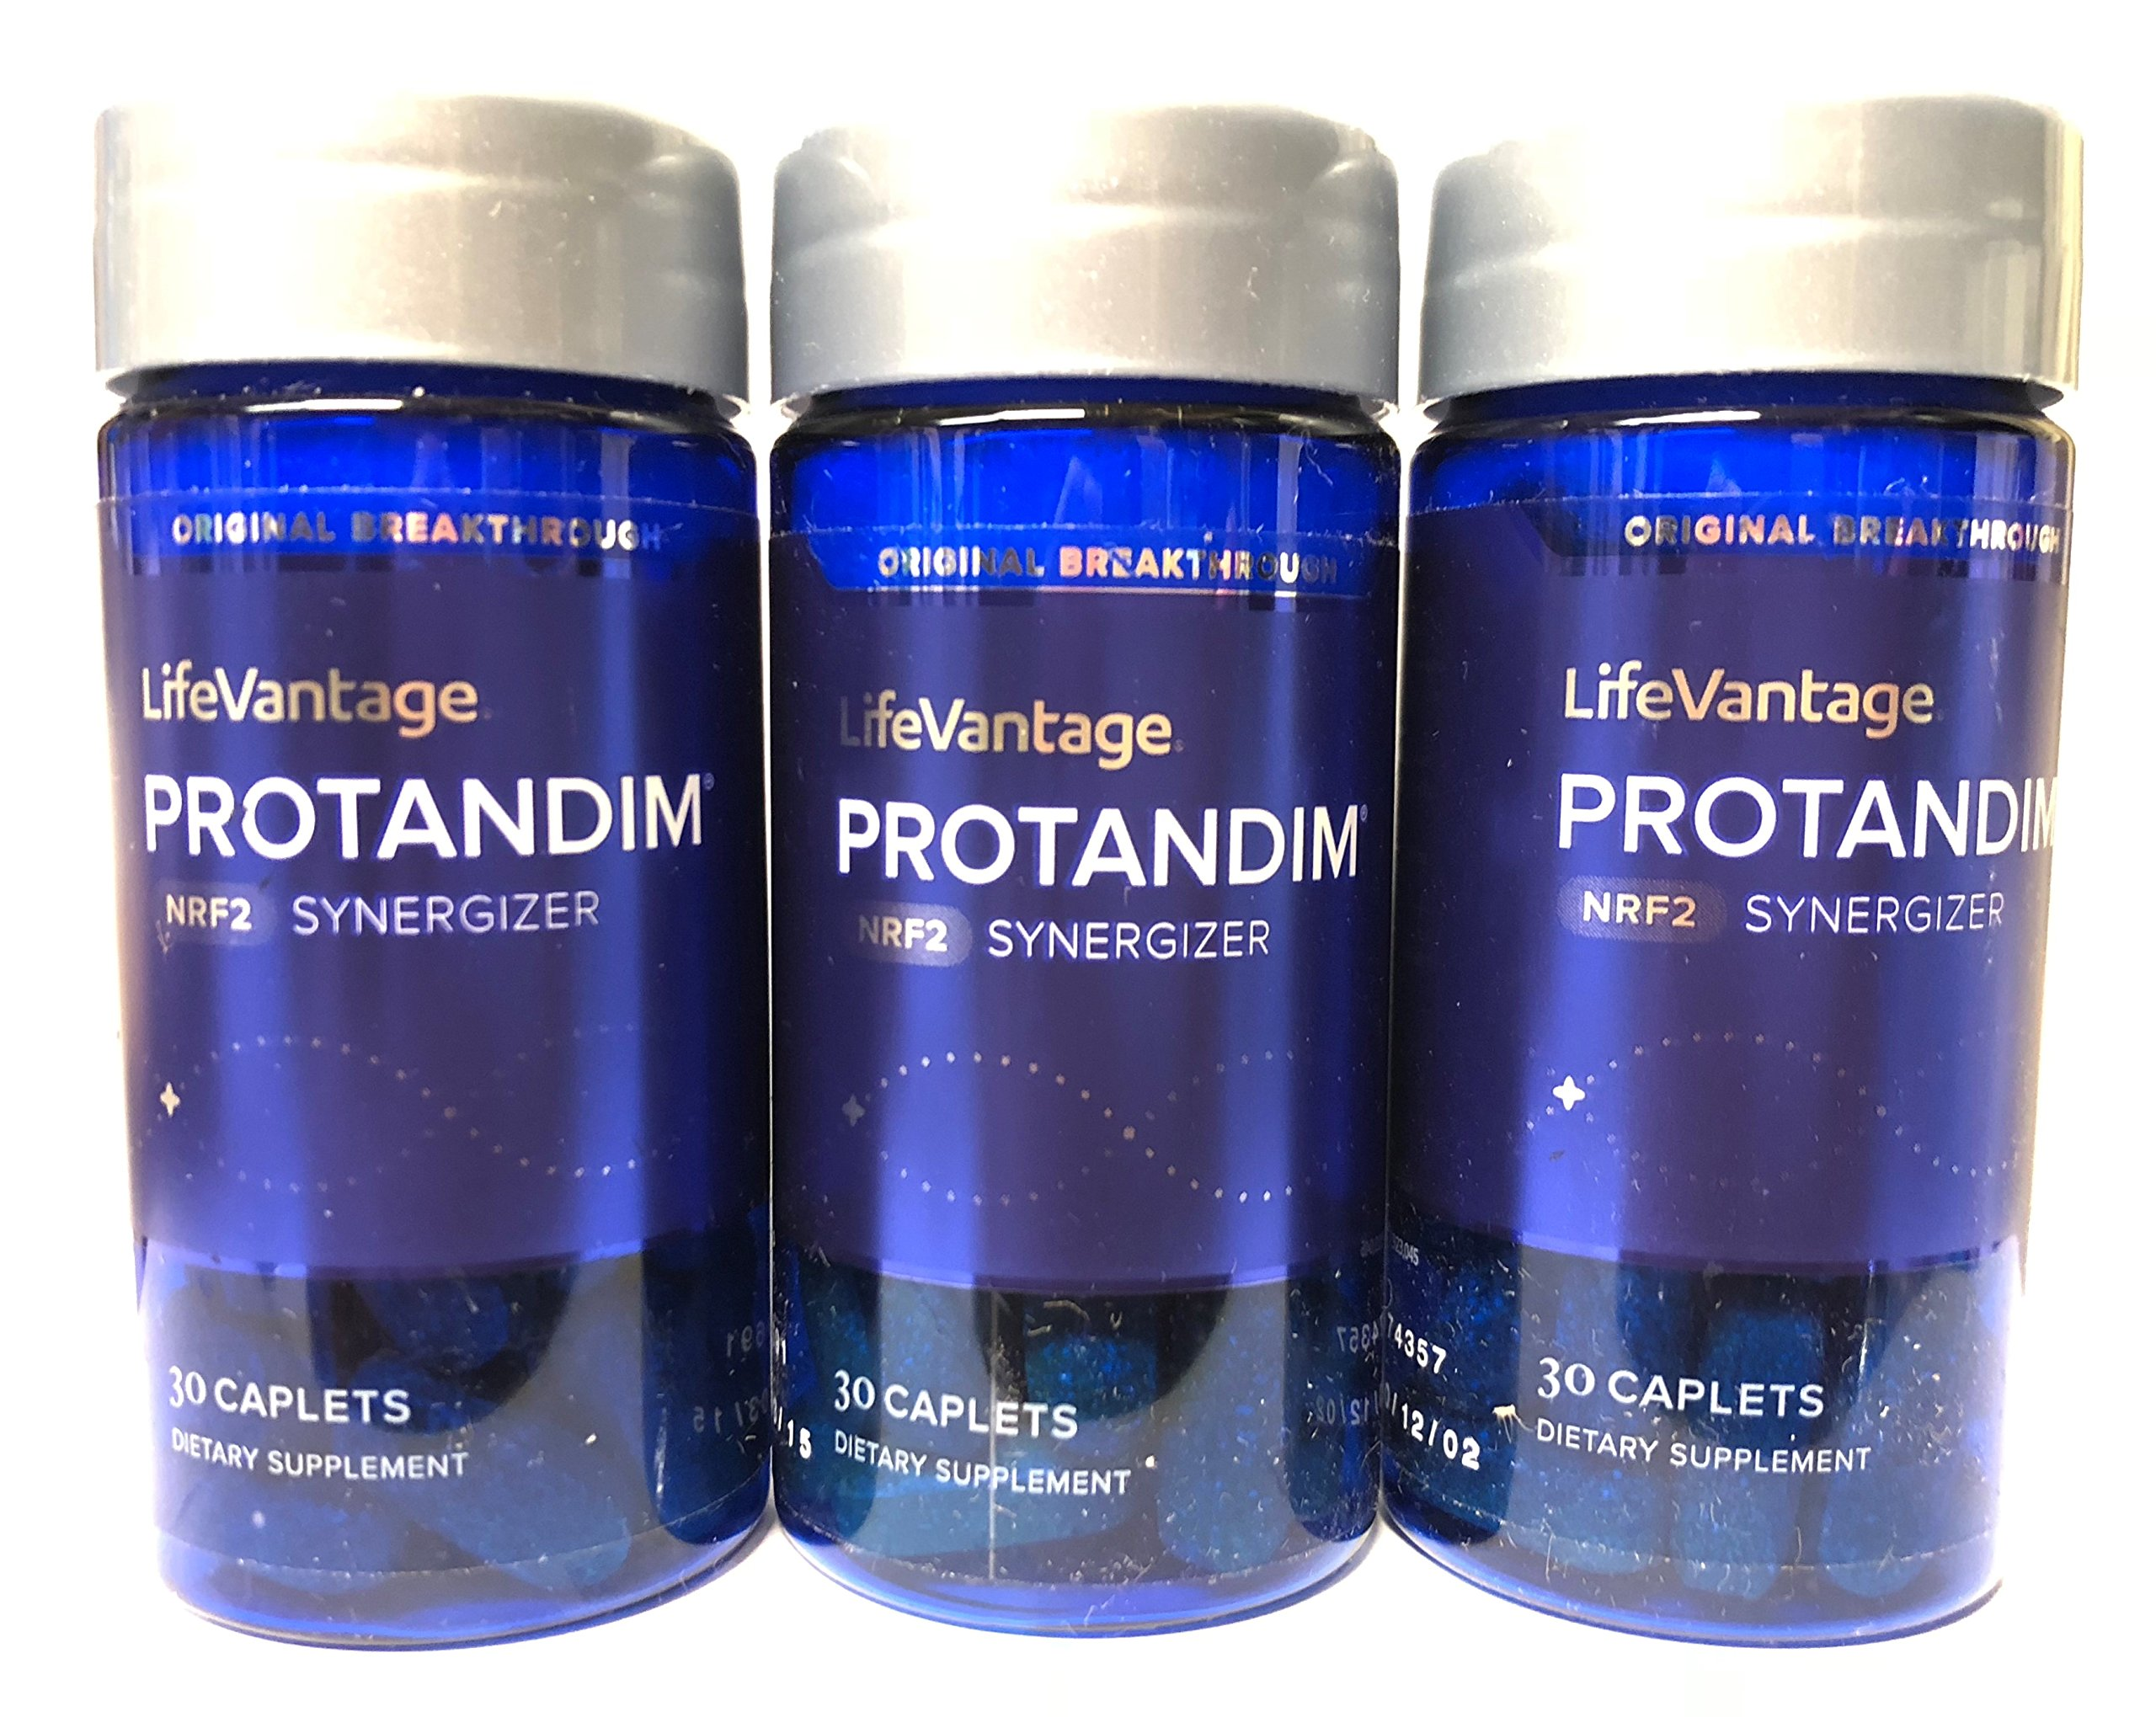 Protandim NFR2 Synergizer (30 Cap/ea) (3 Bottle)